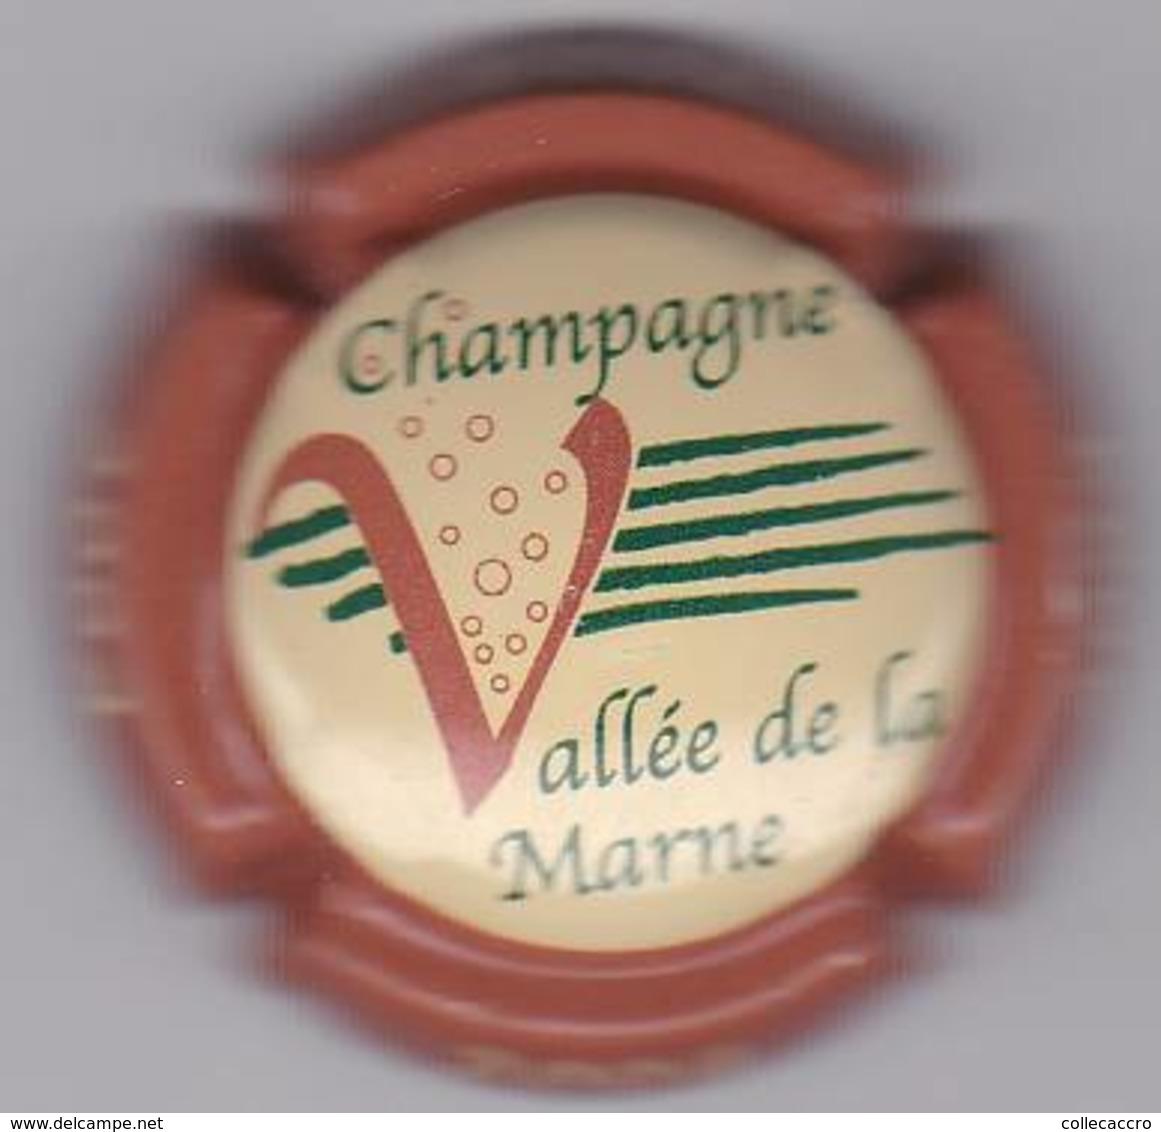 VALLEE DE LA MARNE N°2004 - Champagne